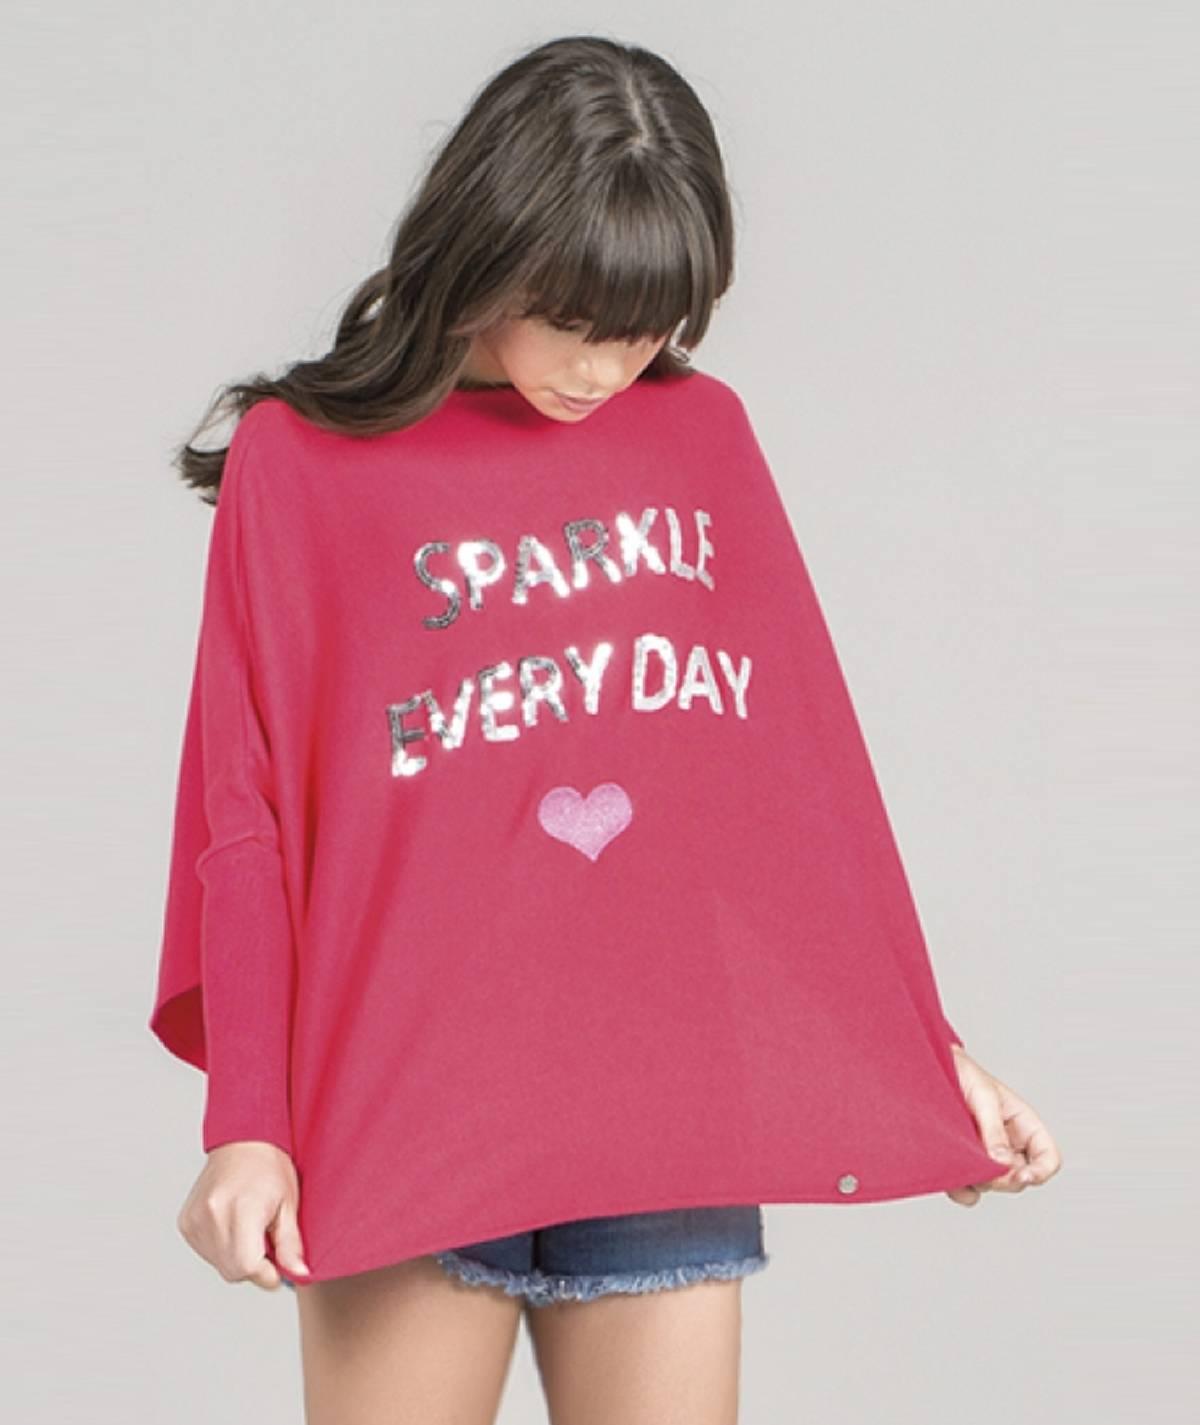 Camisola motivo sparkle kids